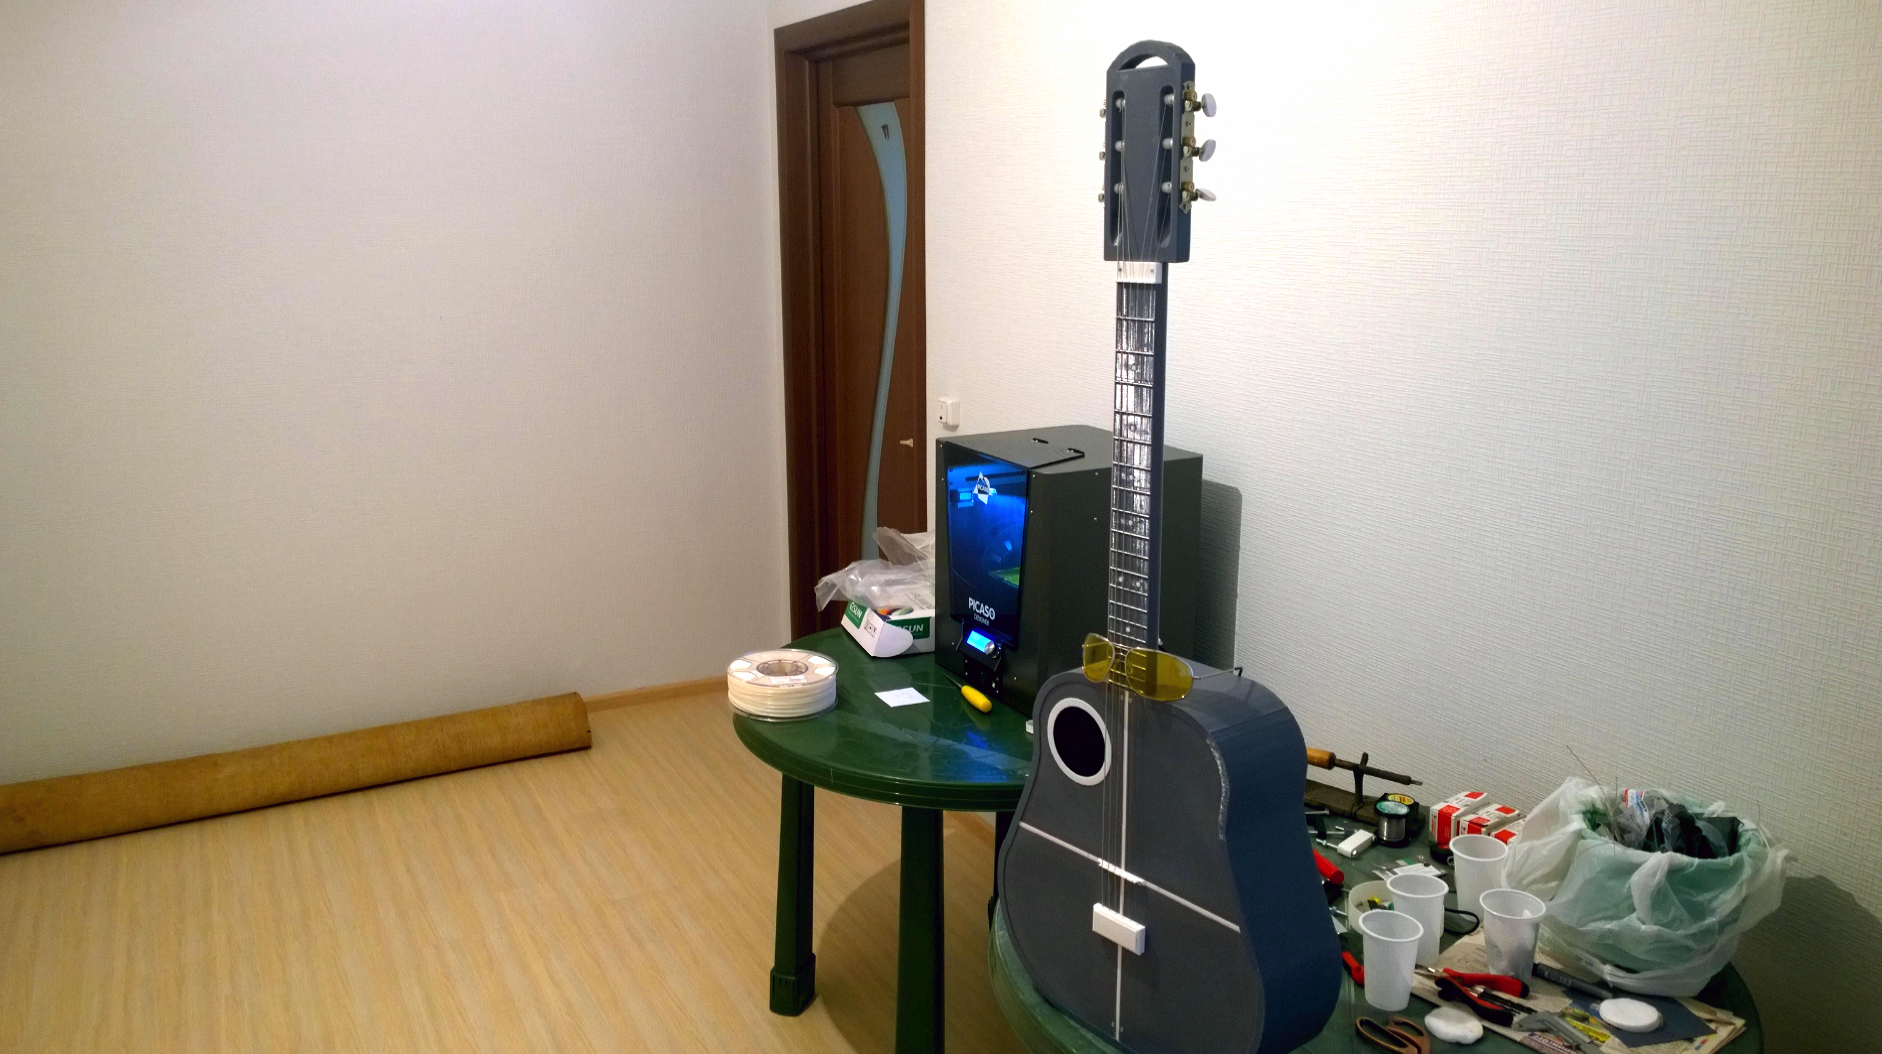 13.png Download free STL file Acoustic guitar with AROMA AG-03M amplifier • 3D printer model, CrocodileGene3d